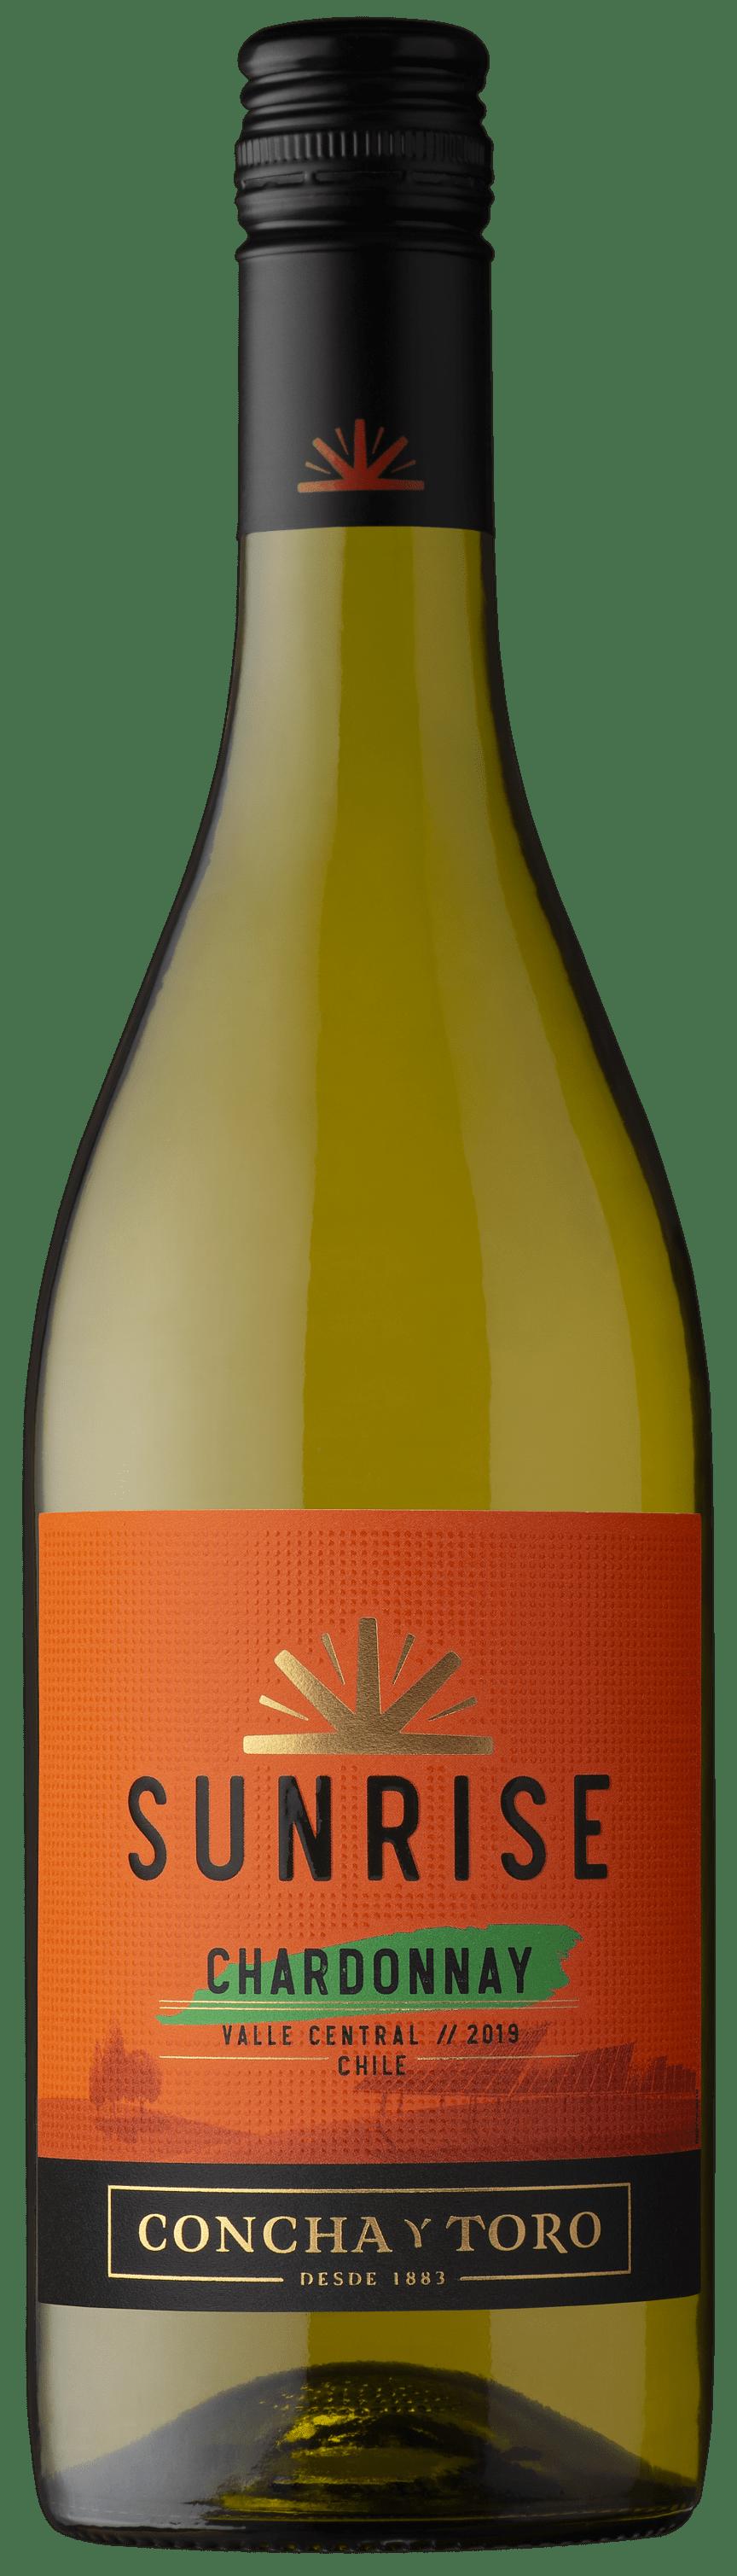 Sunrise Chardonnay